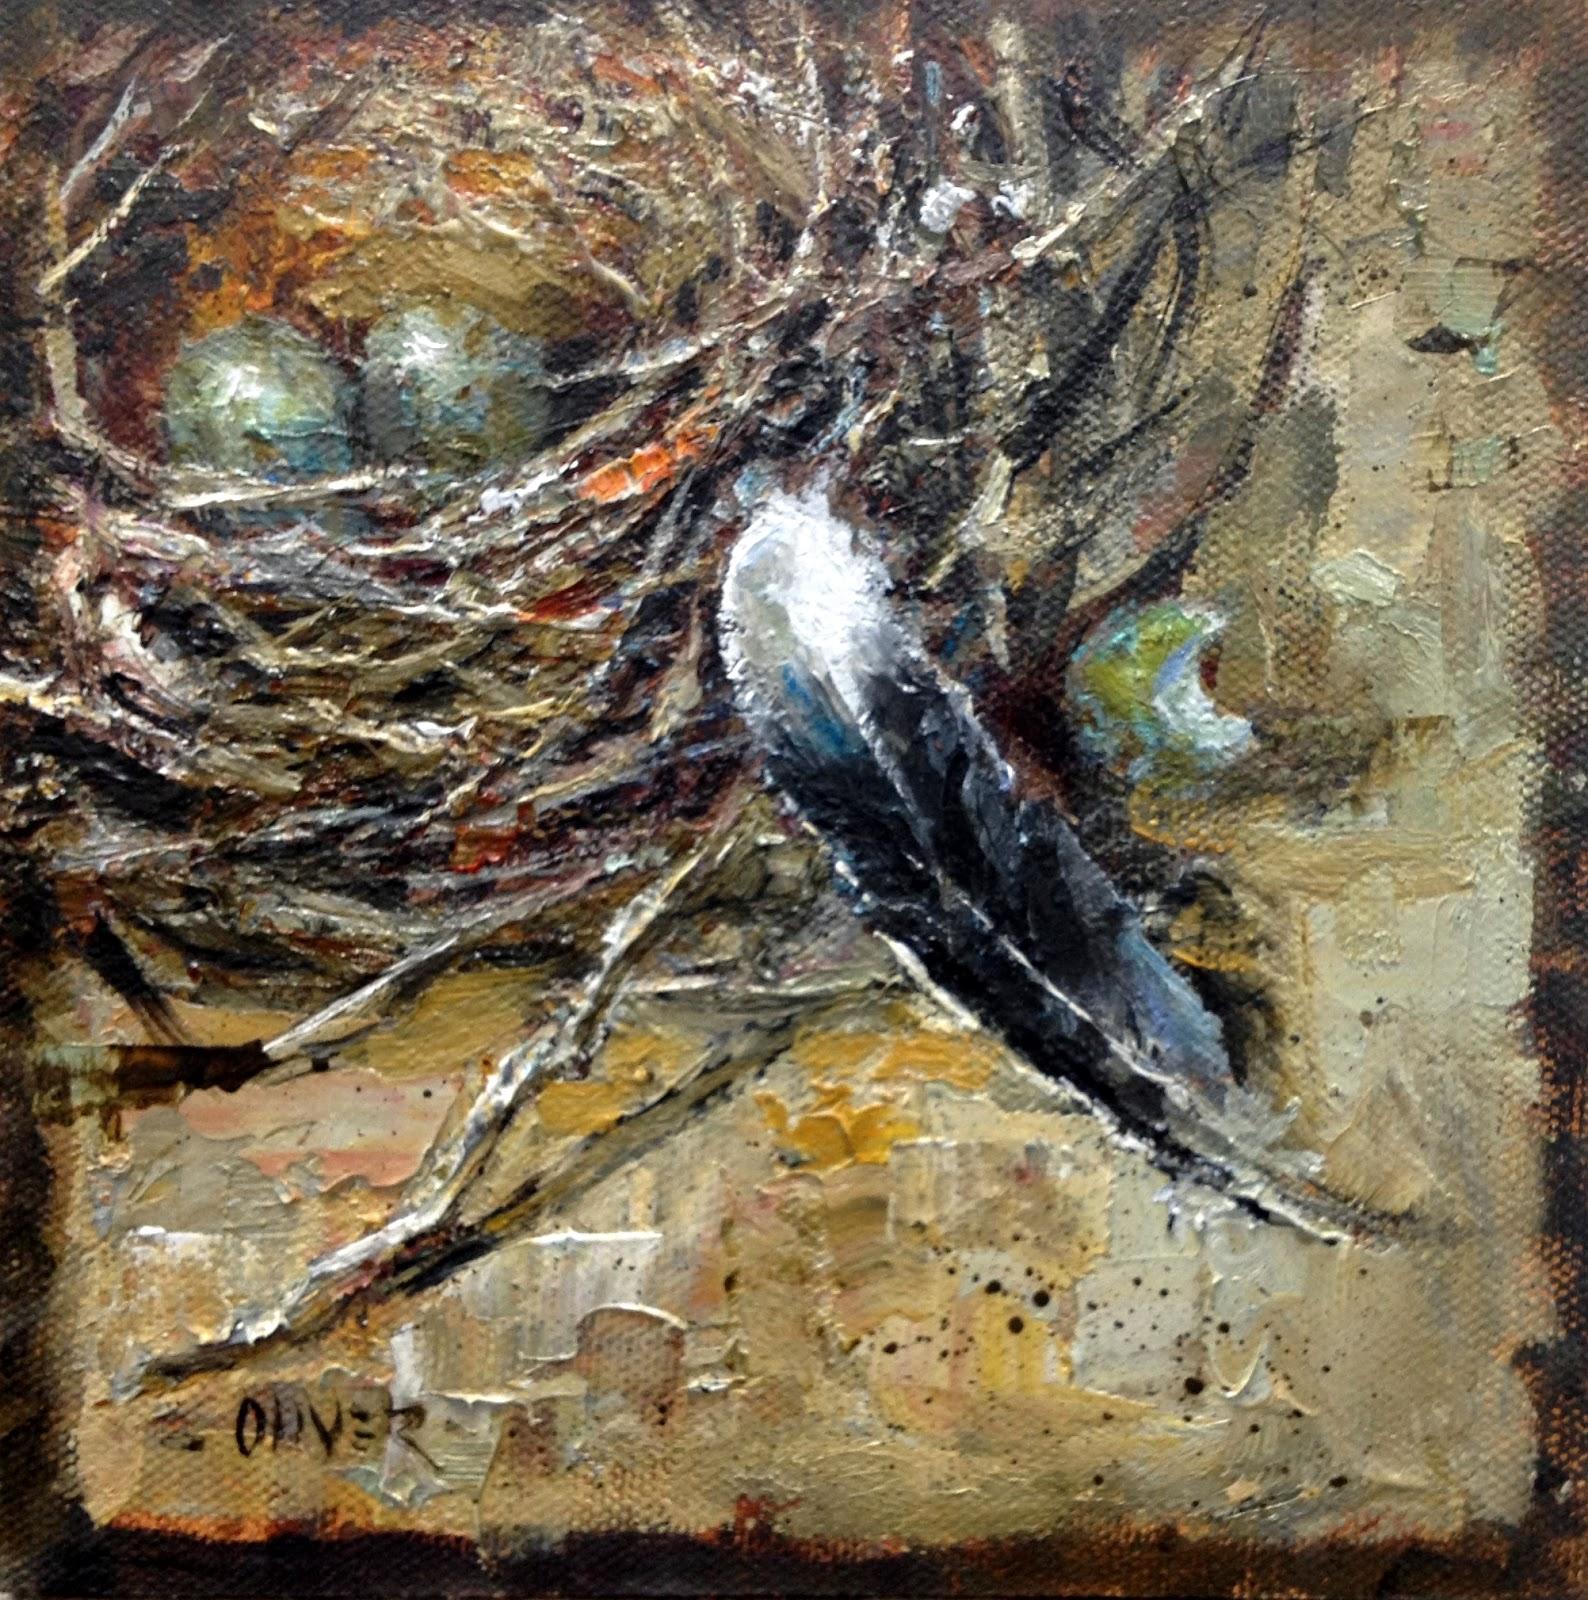 Nest & Feather, oil, 6 x 6, by  Julie Ford Oliver   photo via  Julie's blog